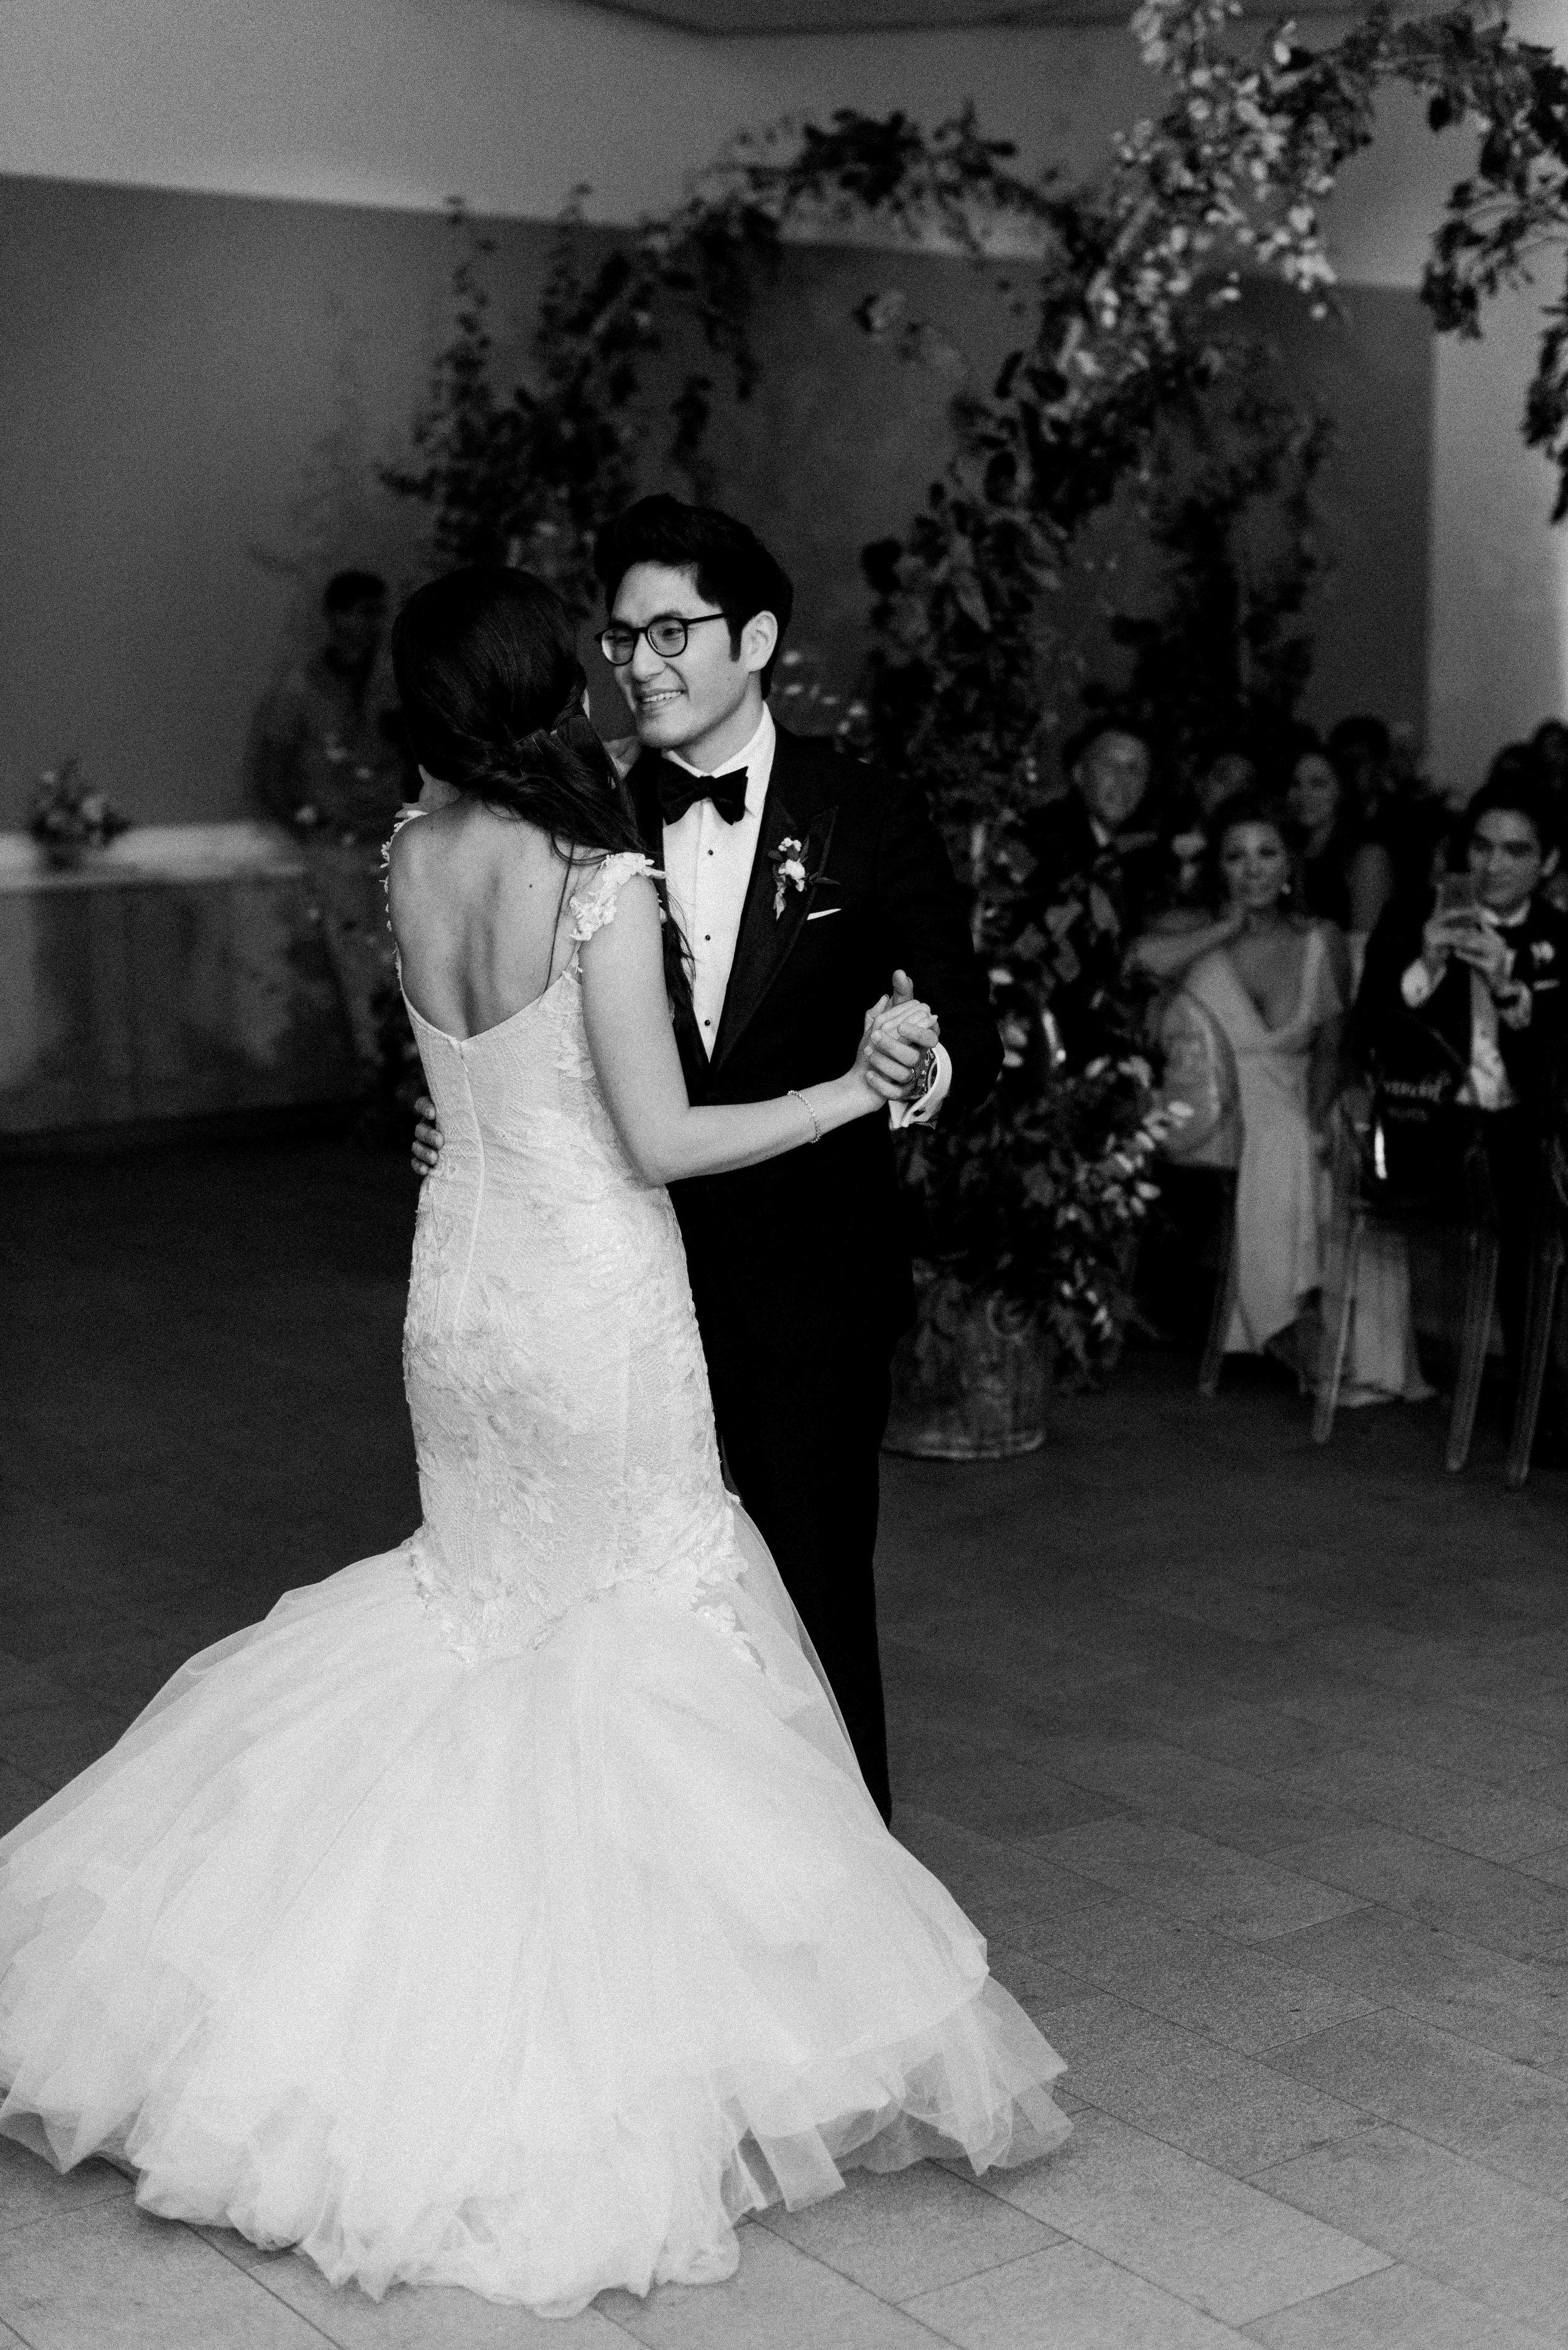 Martha-Stewart-Wedding-Dana-Fernandez-Photography-Josh-Texas-Film-Houston-Wedding-Fine-Art-Photographer-McGovern-Centennial-Gardens-Top-Best-52.jpg